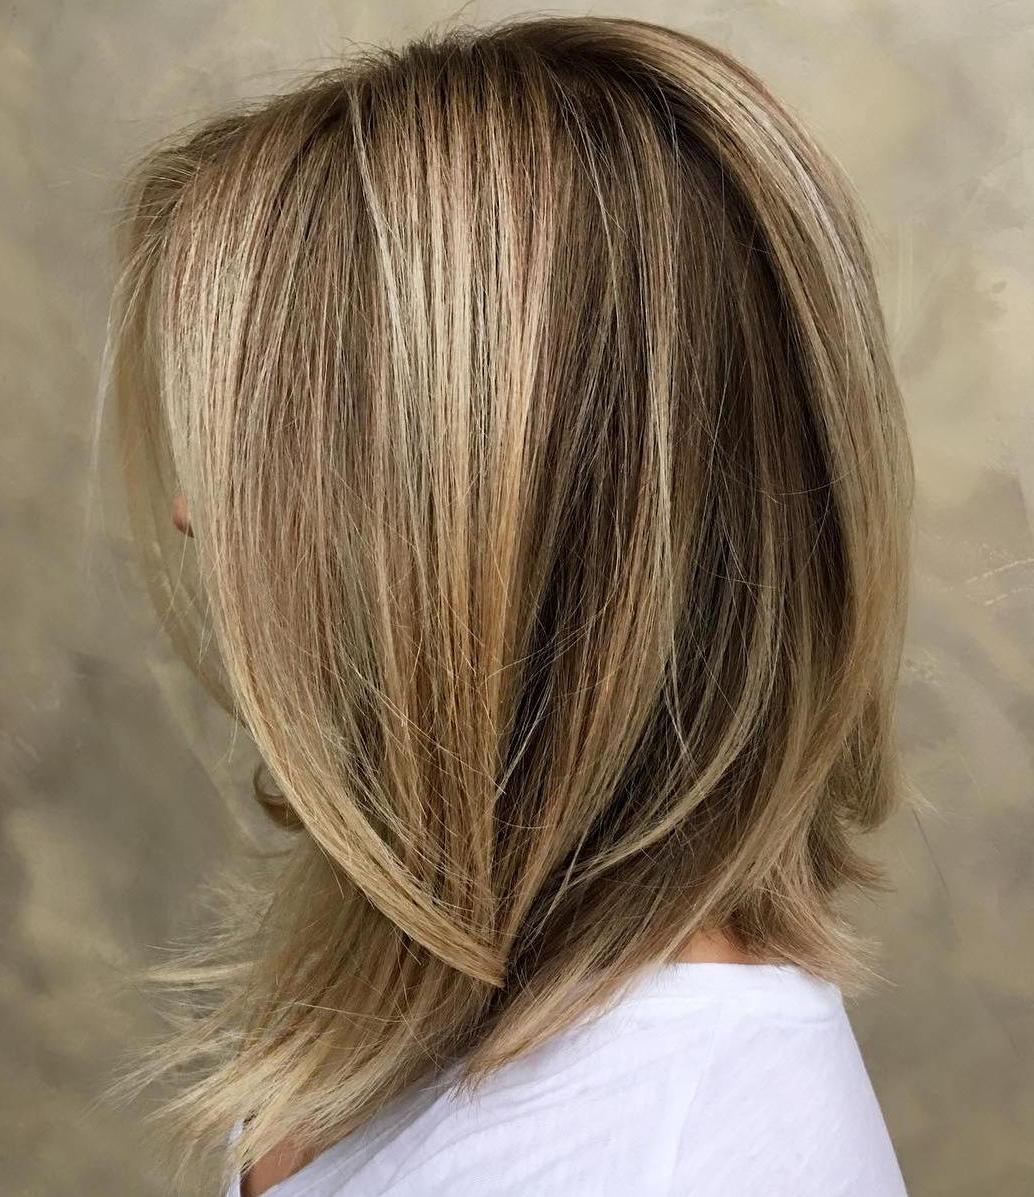 60 Inspiring Long Bob Hairstyles And Long Bob Haircuts For With Blunt Cut Blonde Balayage Bob Hairstyles (View 5 of 20)